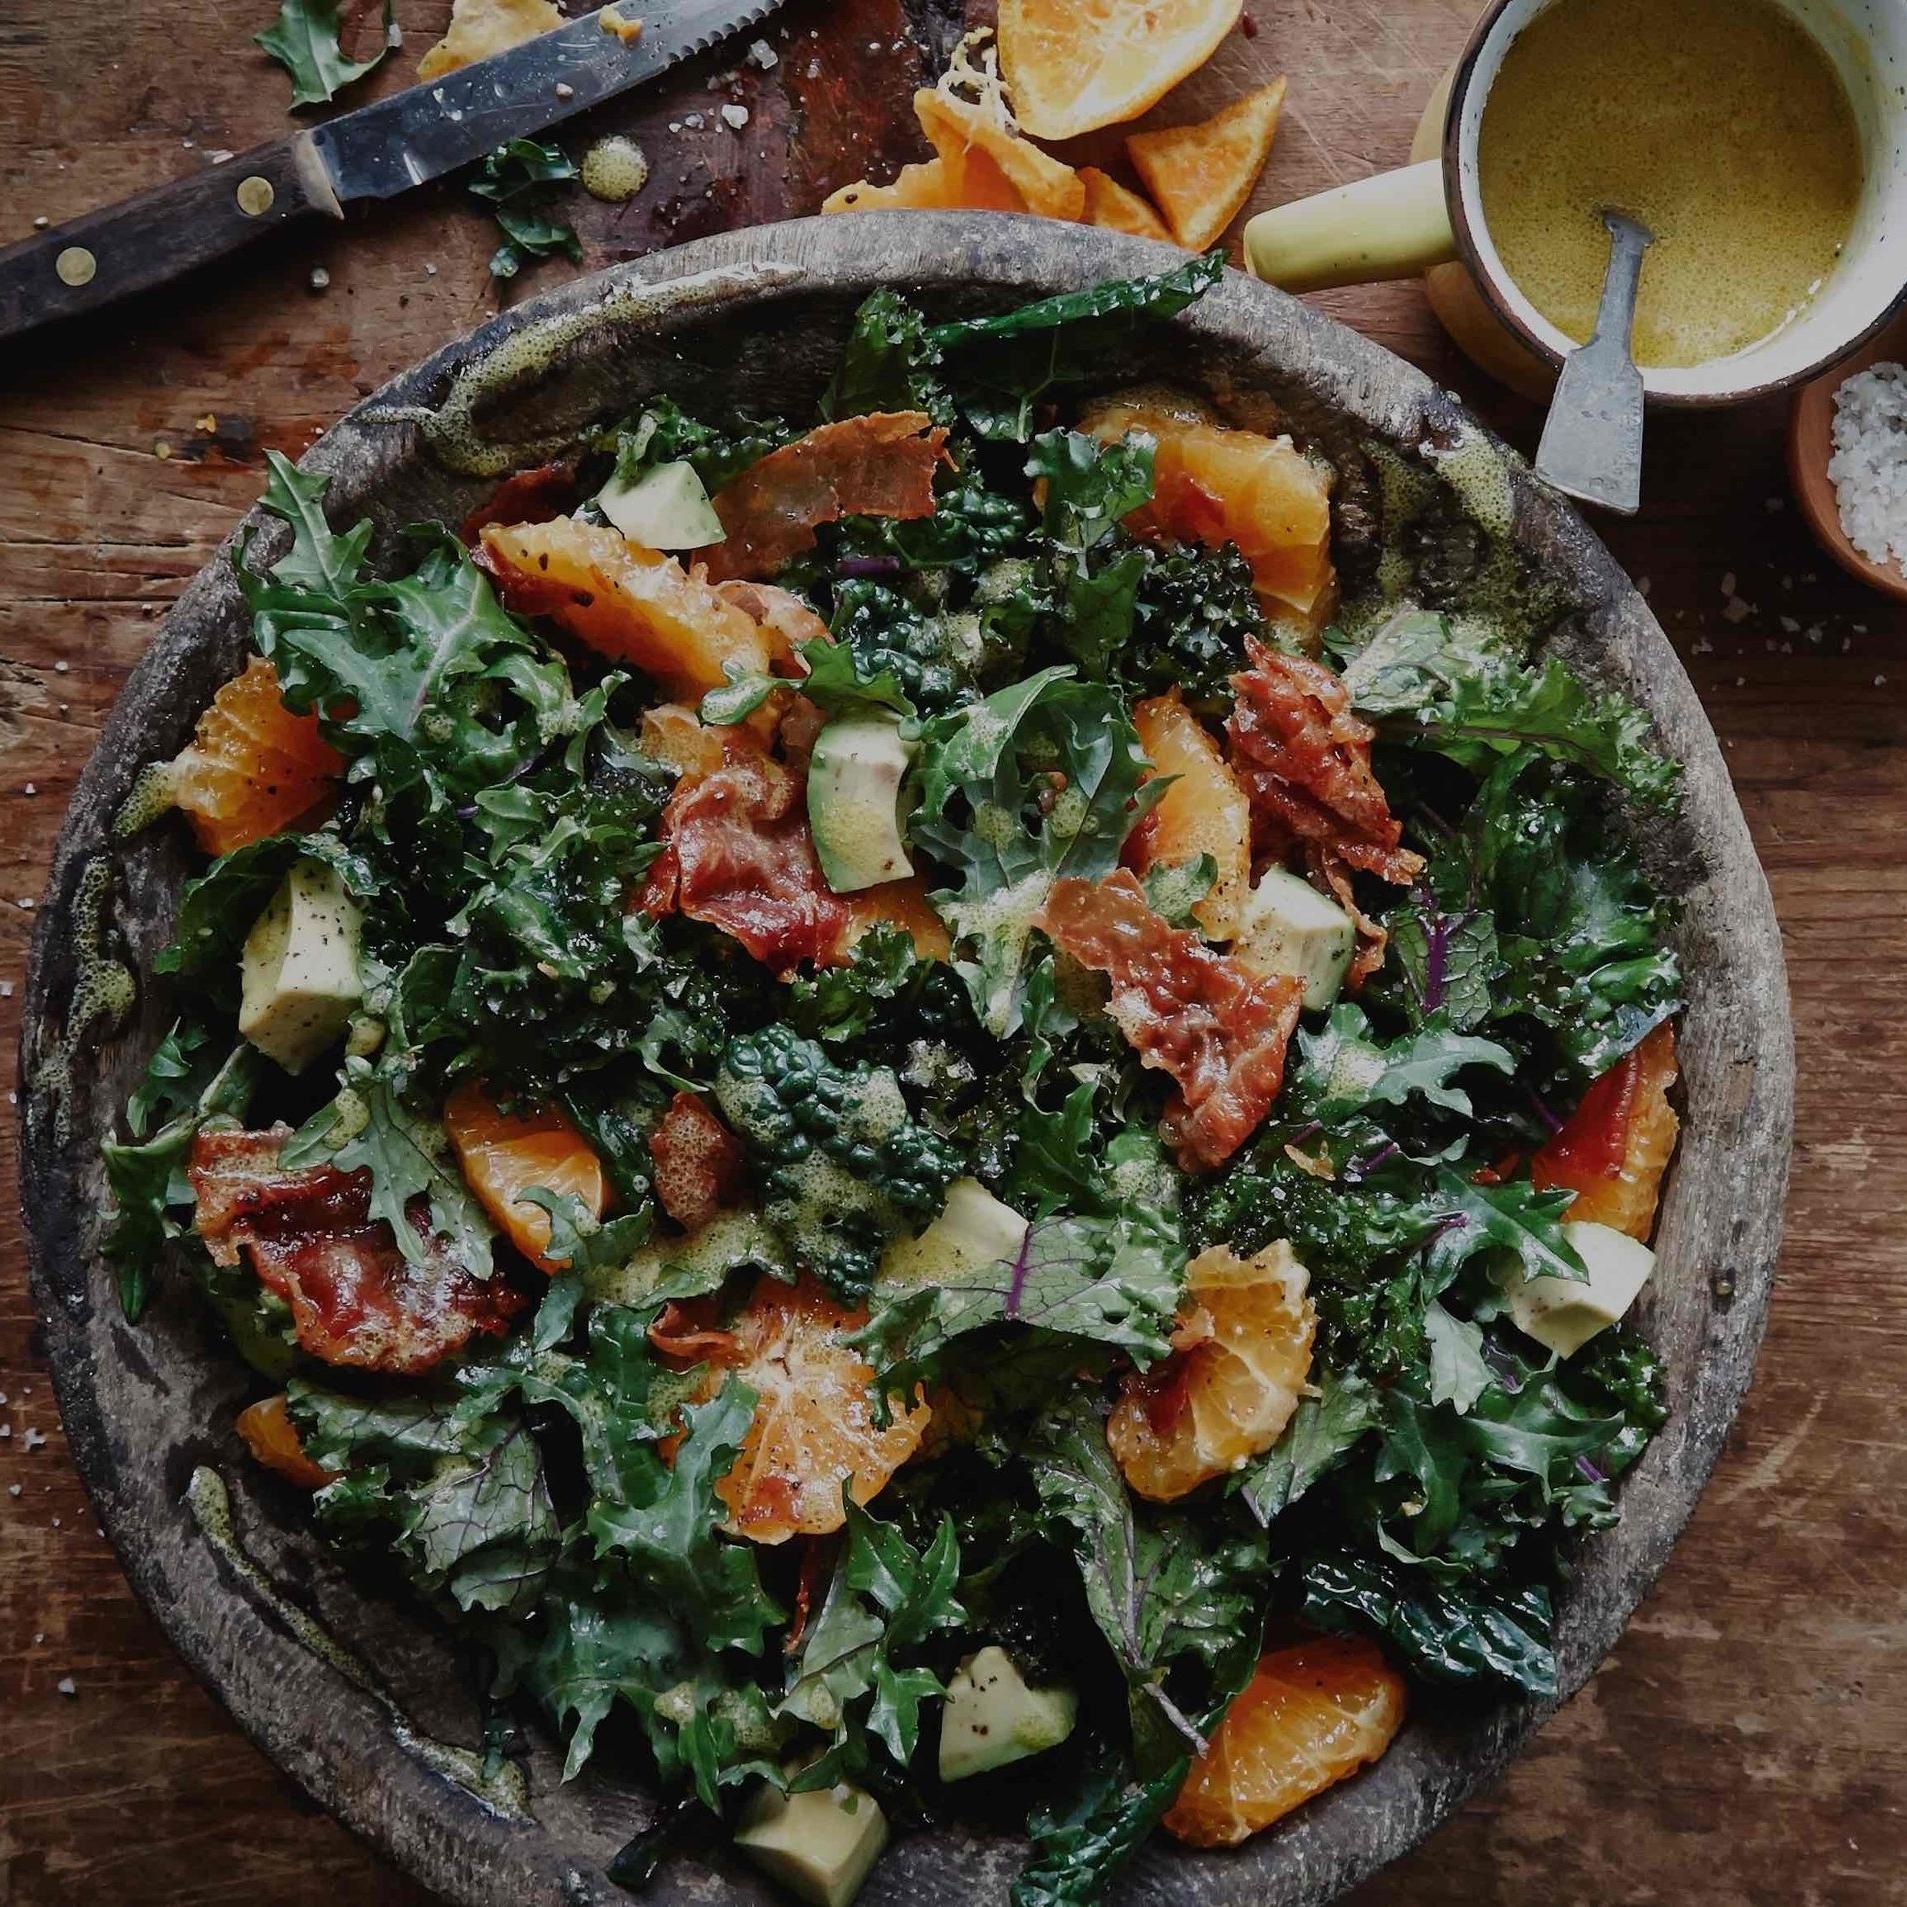 kale salad tangerine.jpg